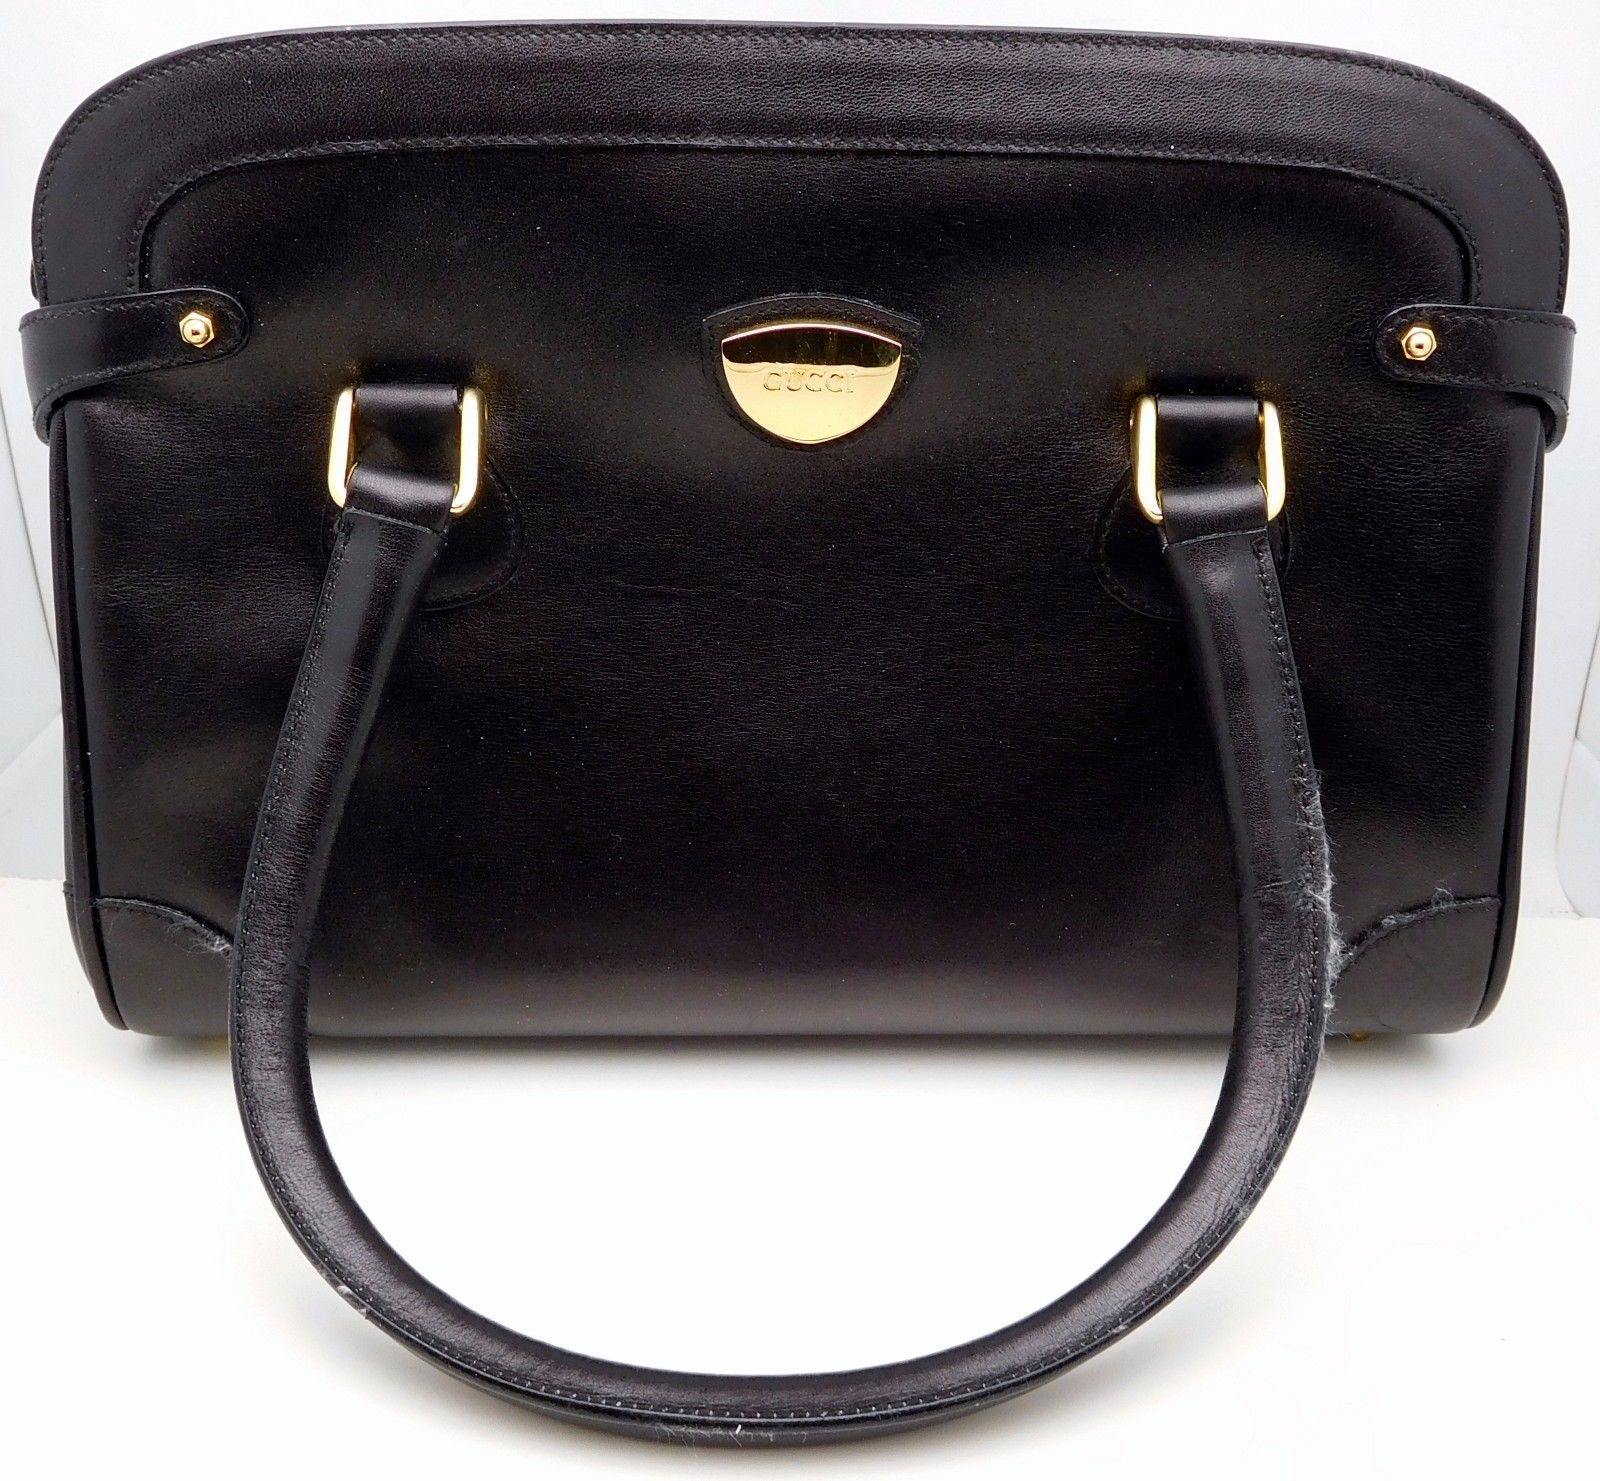 #Trending - GUCCI Ladies Black Handbag Purse https://t.co/WST1aQGTAP Ebay https://t.co/tr2mGJnhgl